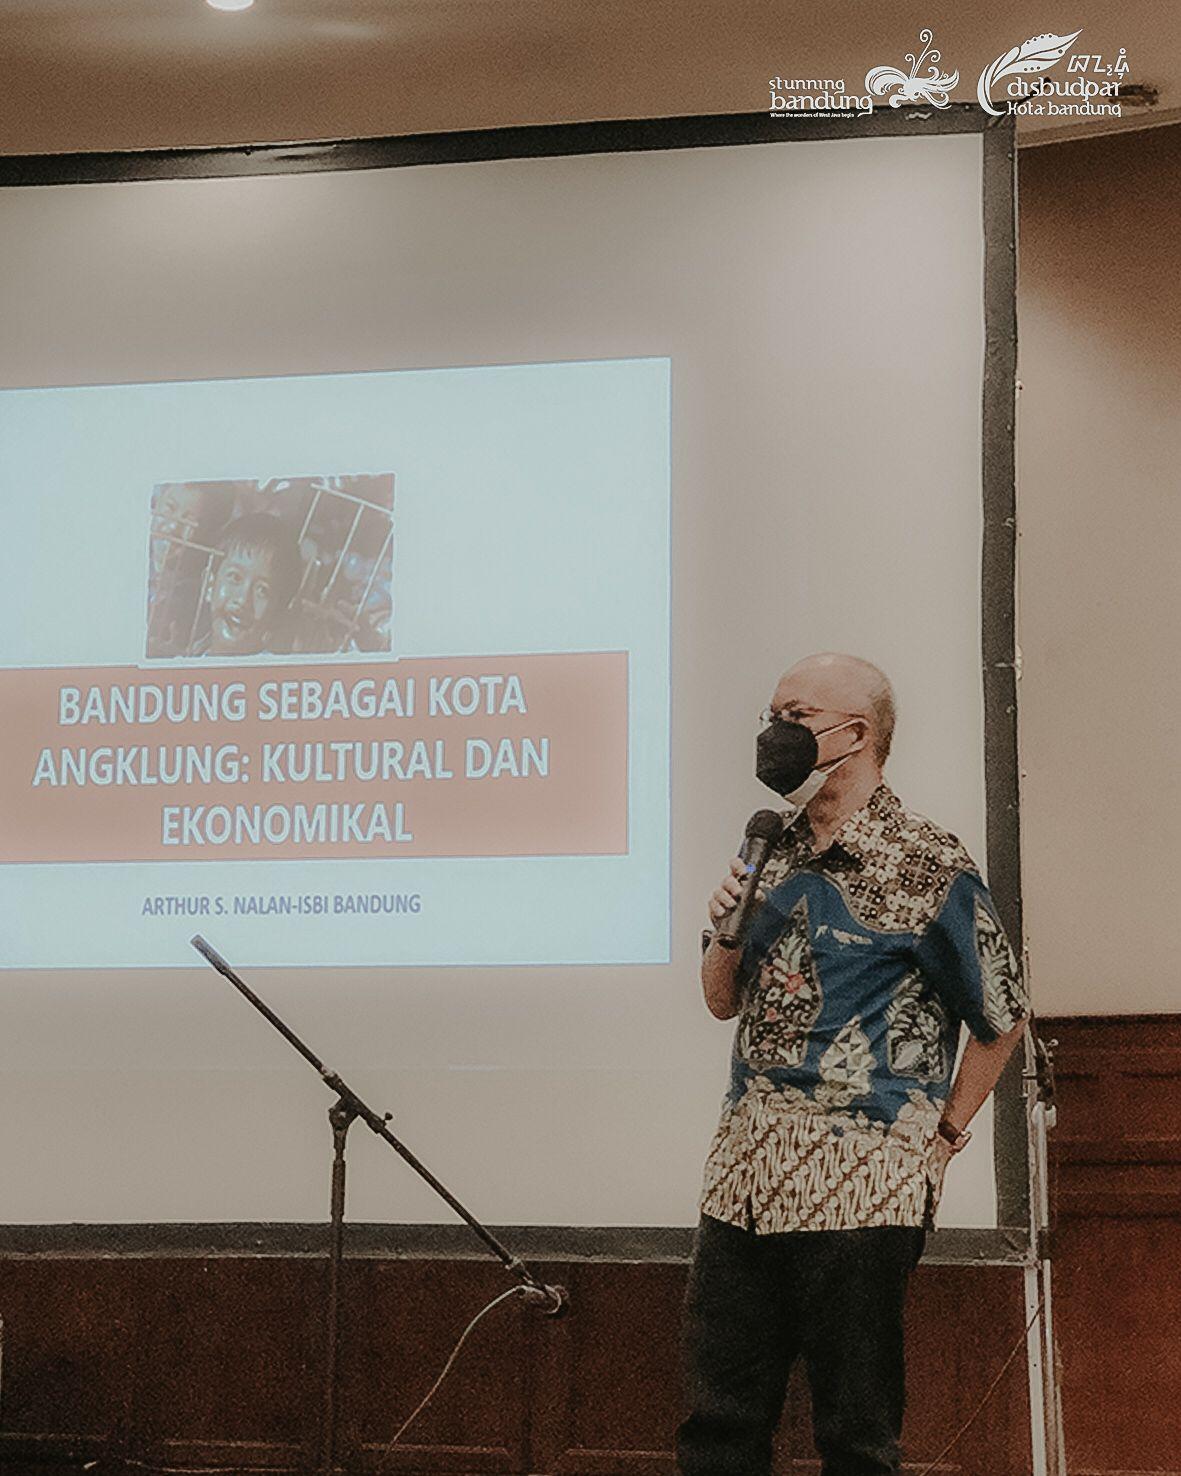 Pelatihan dan Workshop Objek Pemajuan Kebudayaan (OPK) Angklung